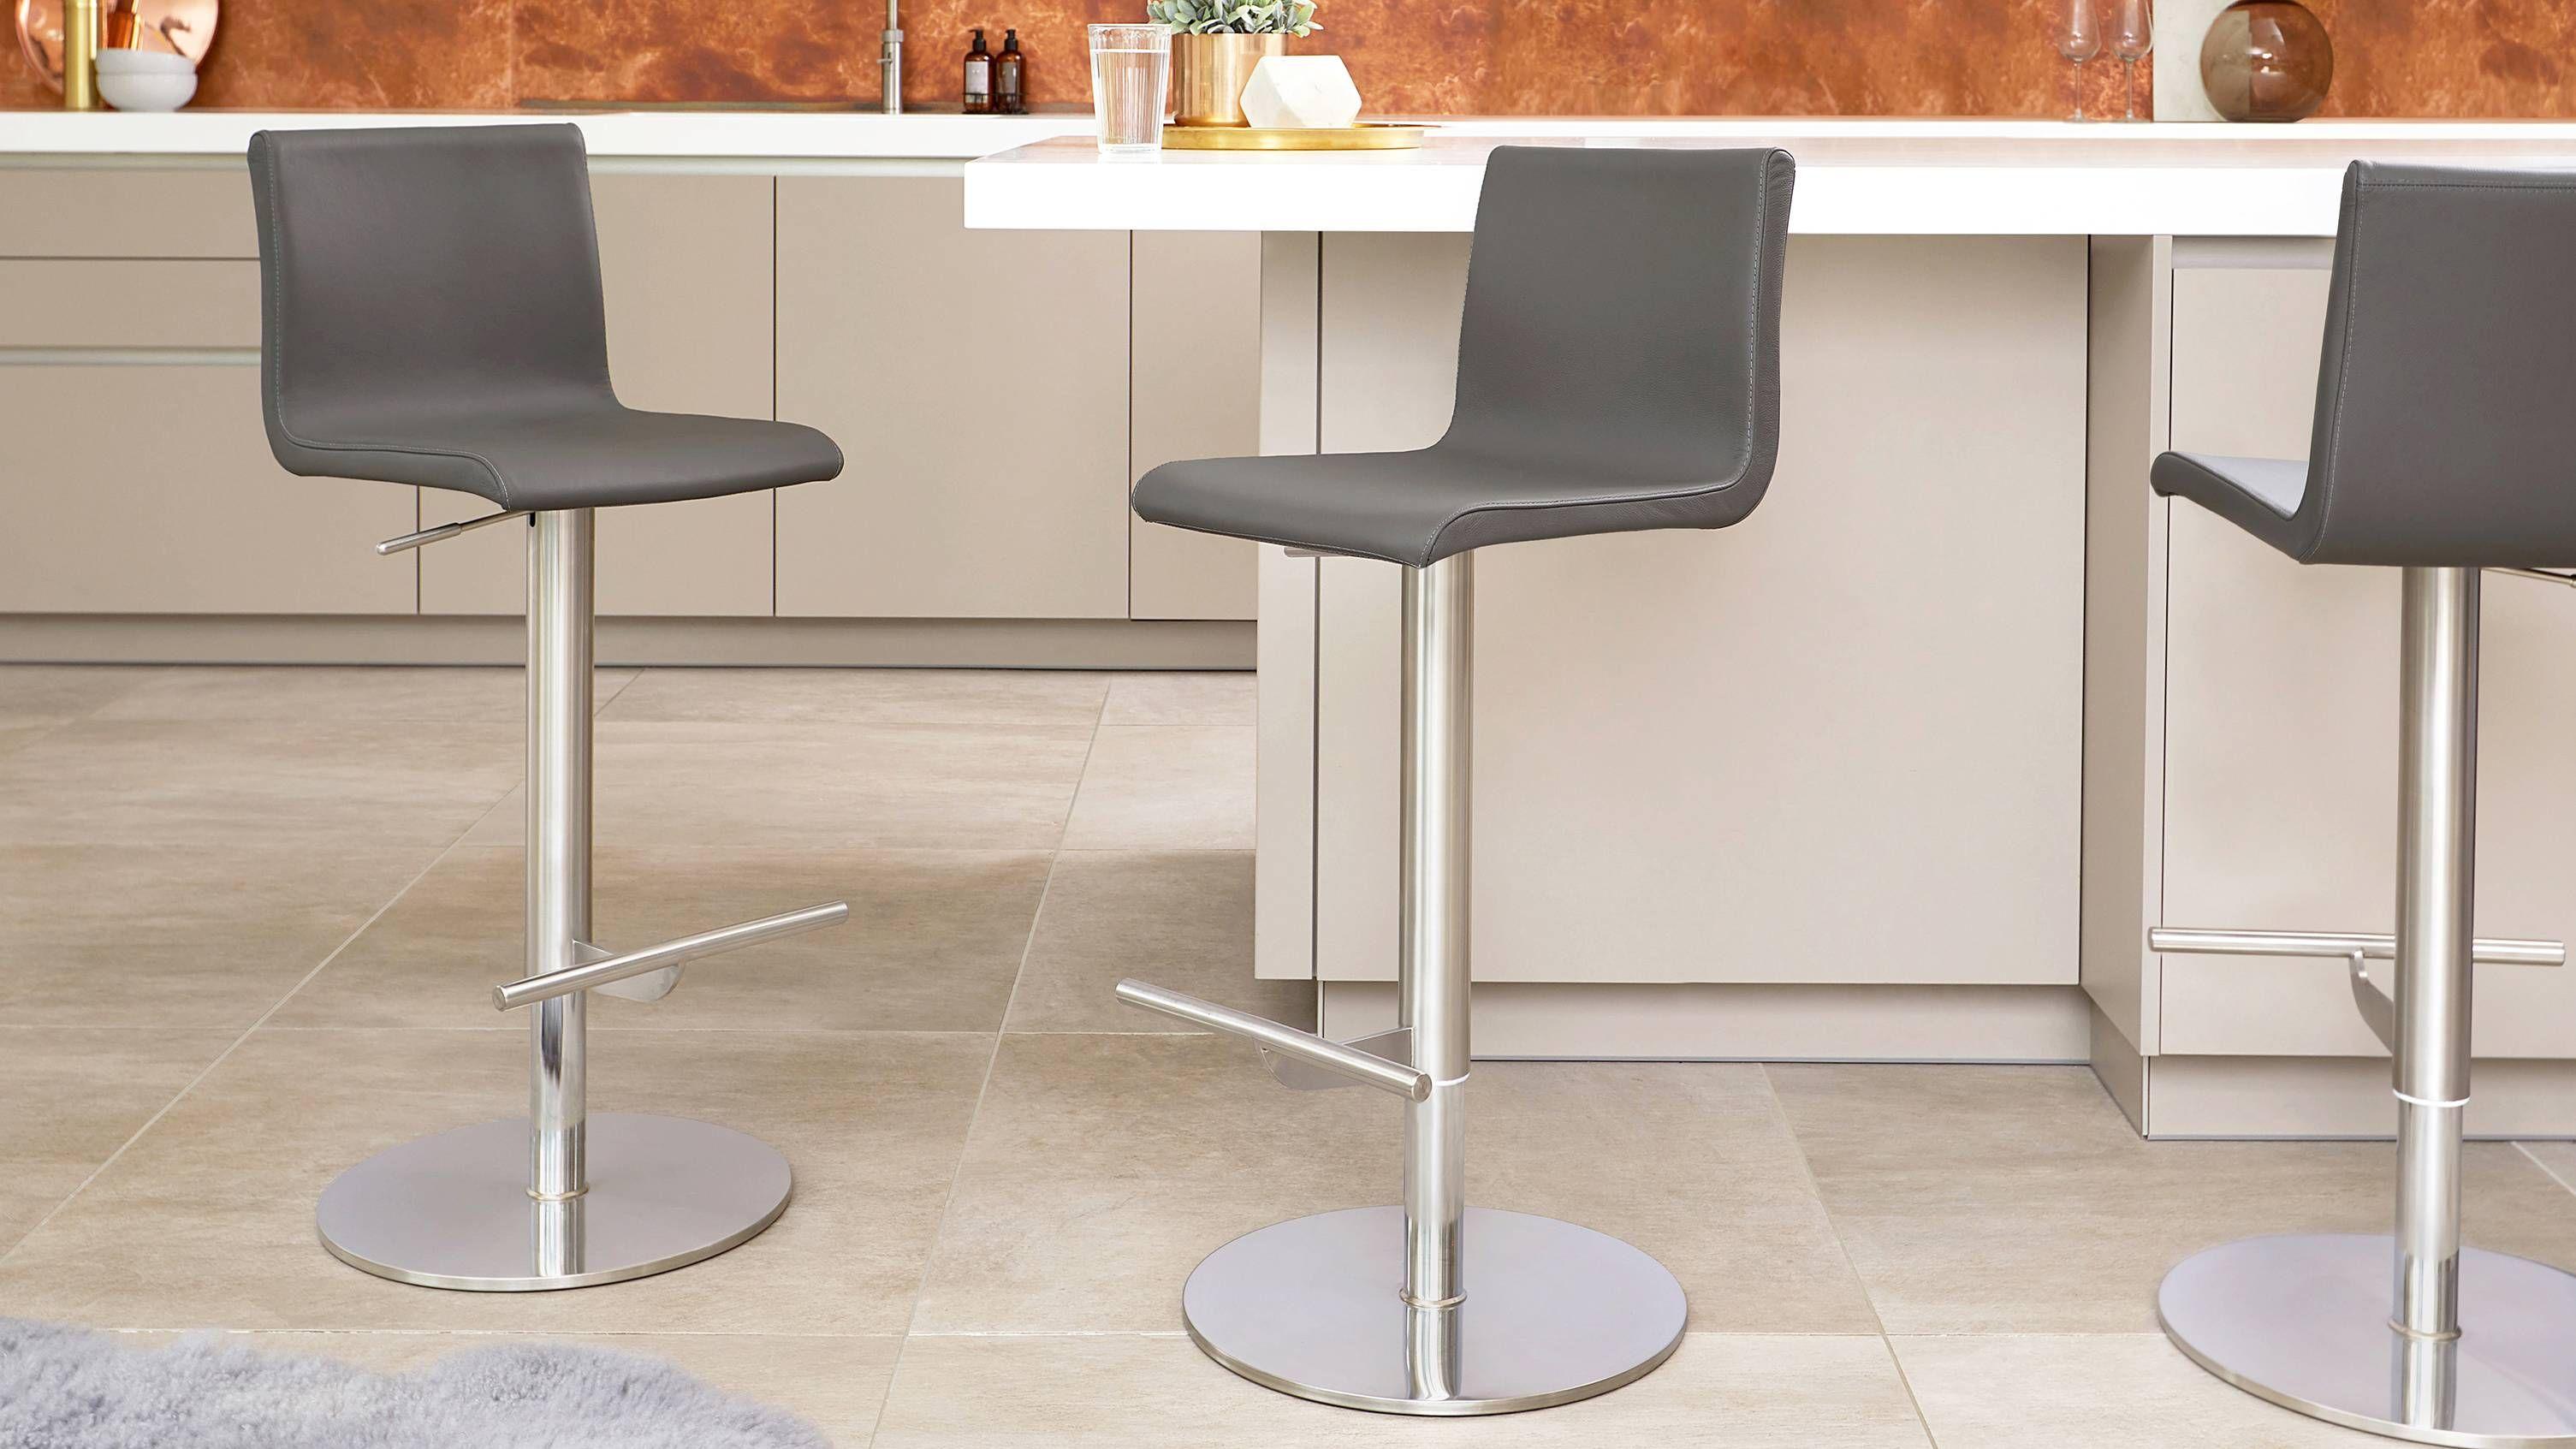 Kiki Light Grey Real Leather Gas Lift Bar Stool Bar Stools Modern Kitchen Stools Classic Bar Stools